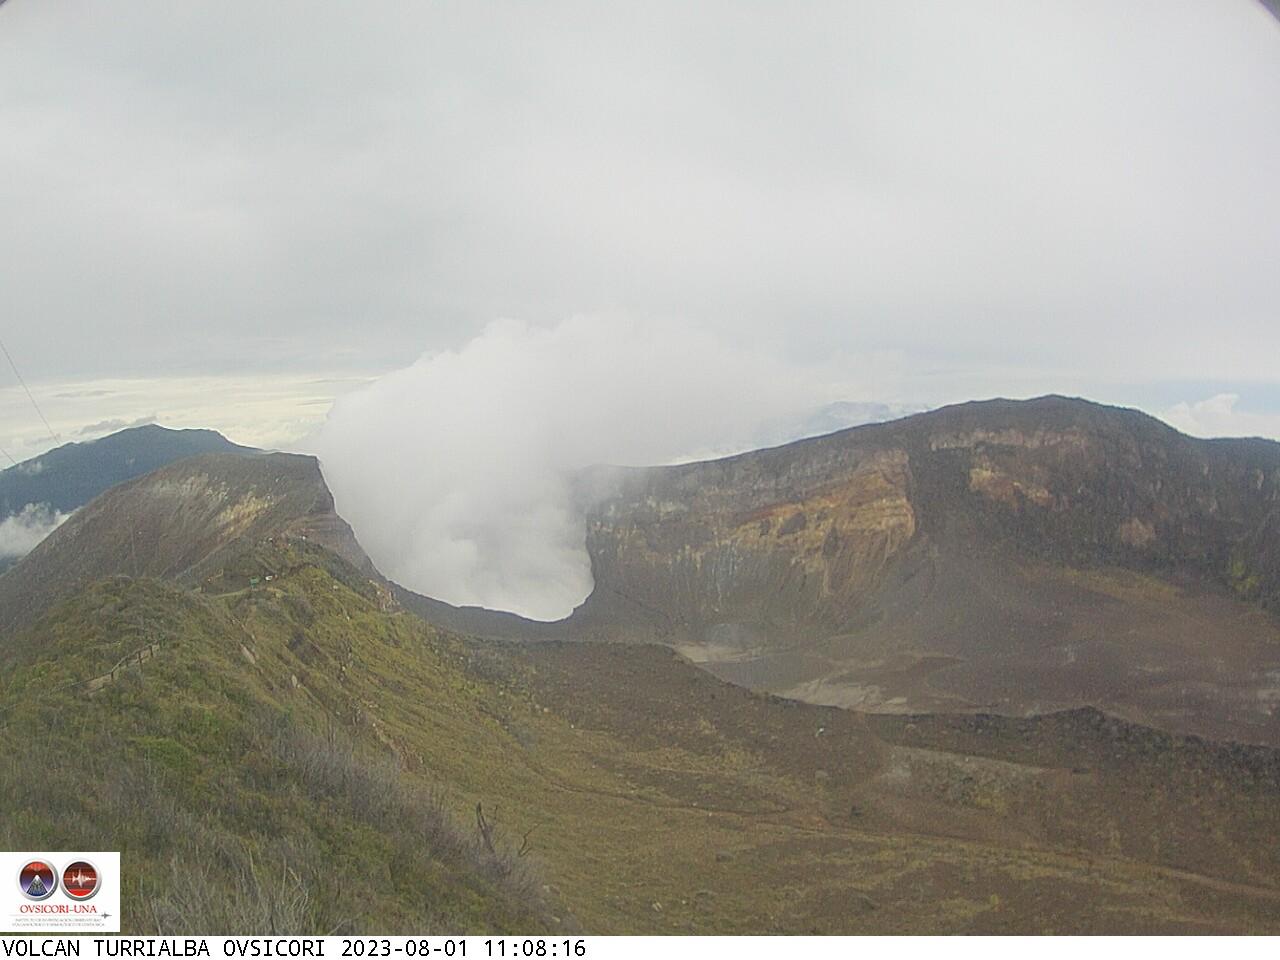 Volcano Turrialba Sun. 11:08